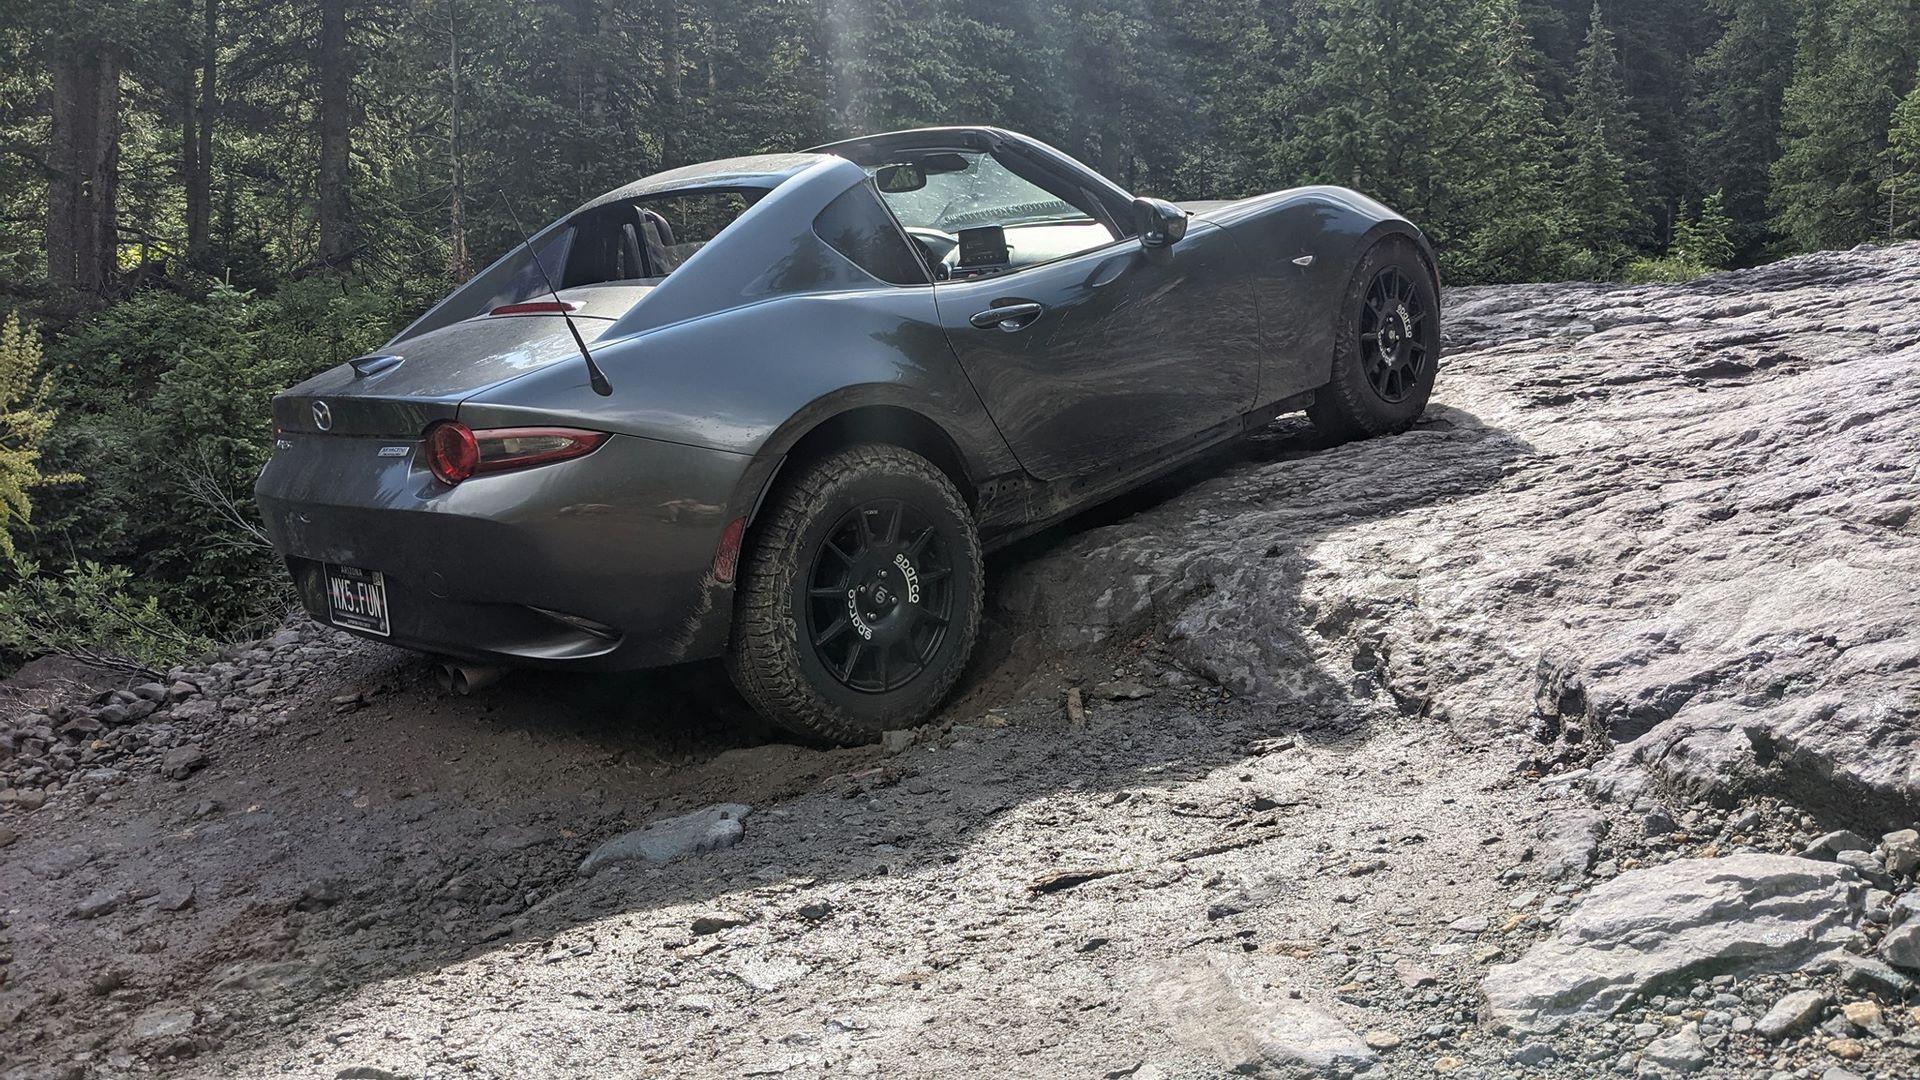 Mazda-MX-5-RF-off-road-3